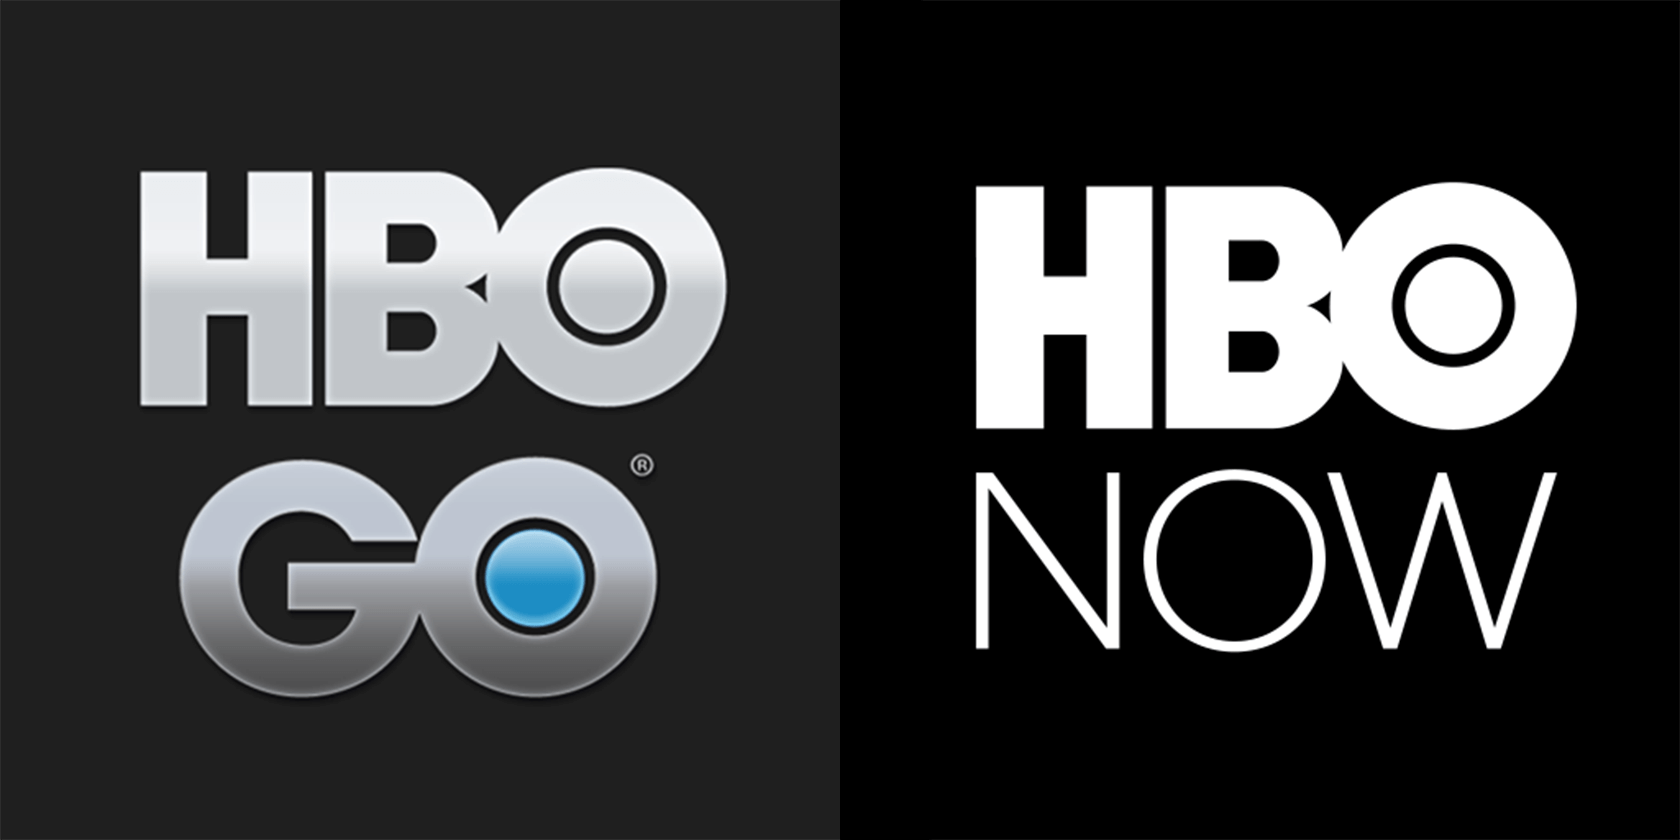 مشاهدة مسلسل Game of Thrones عبر خدمة HBO